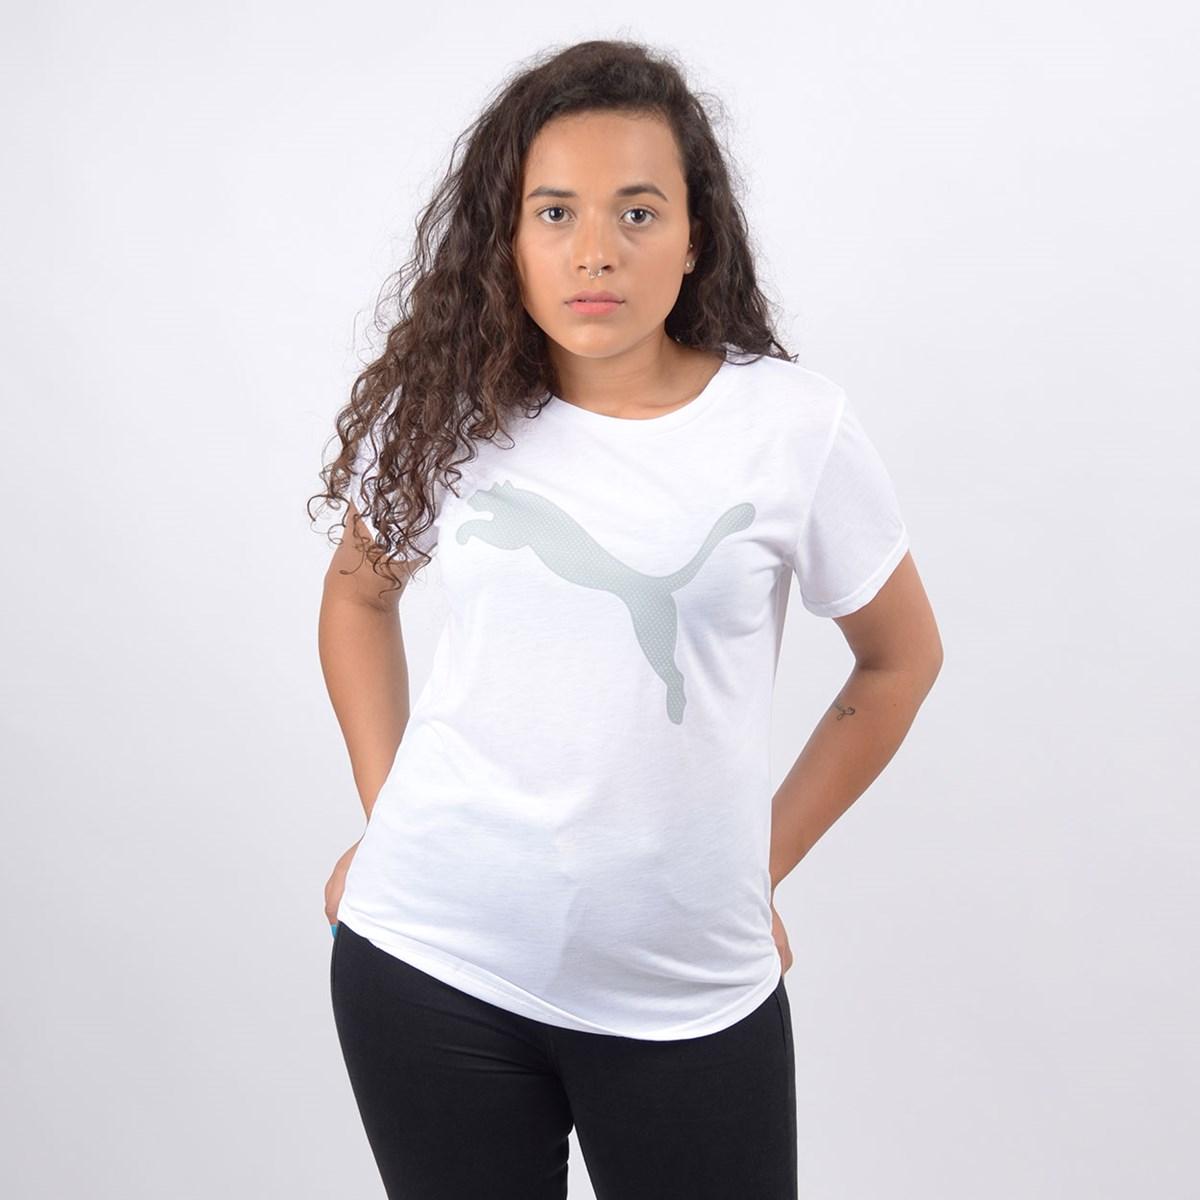 Camiseta Puma Feminina Evostripe Tee White 58124102